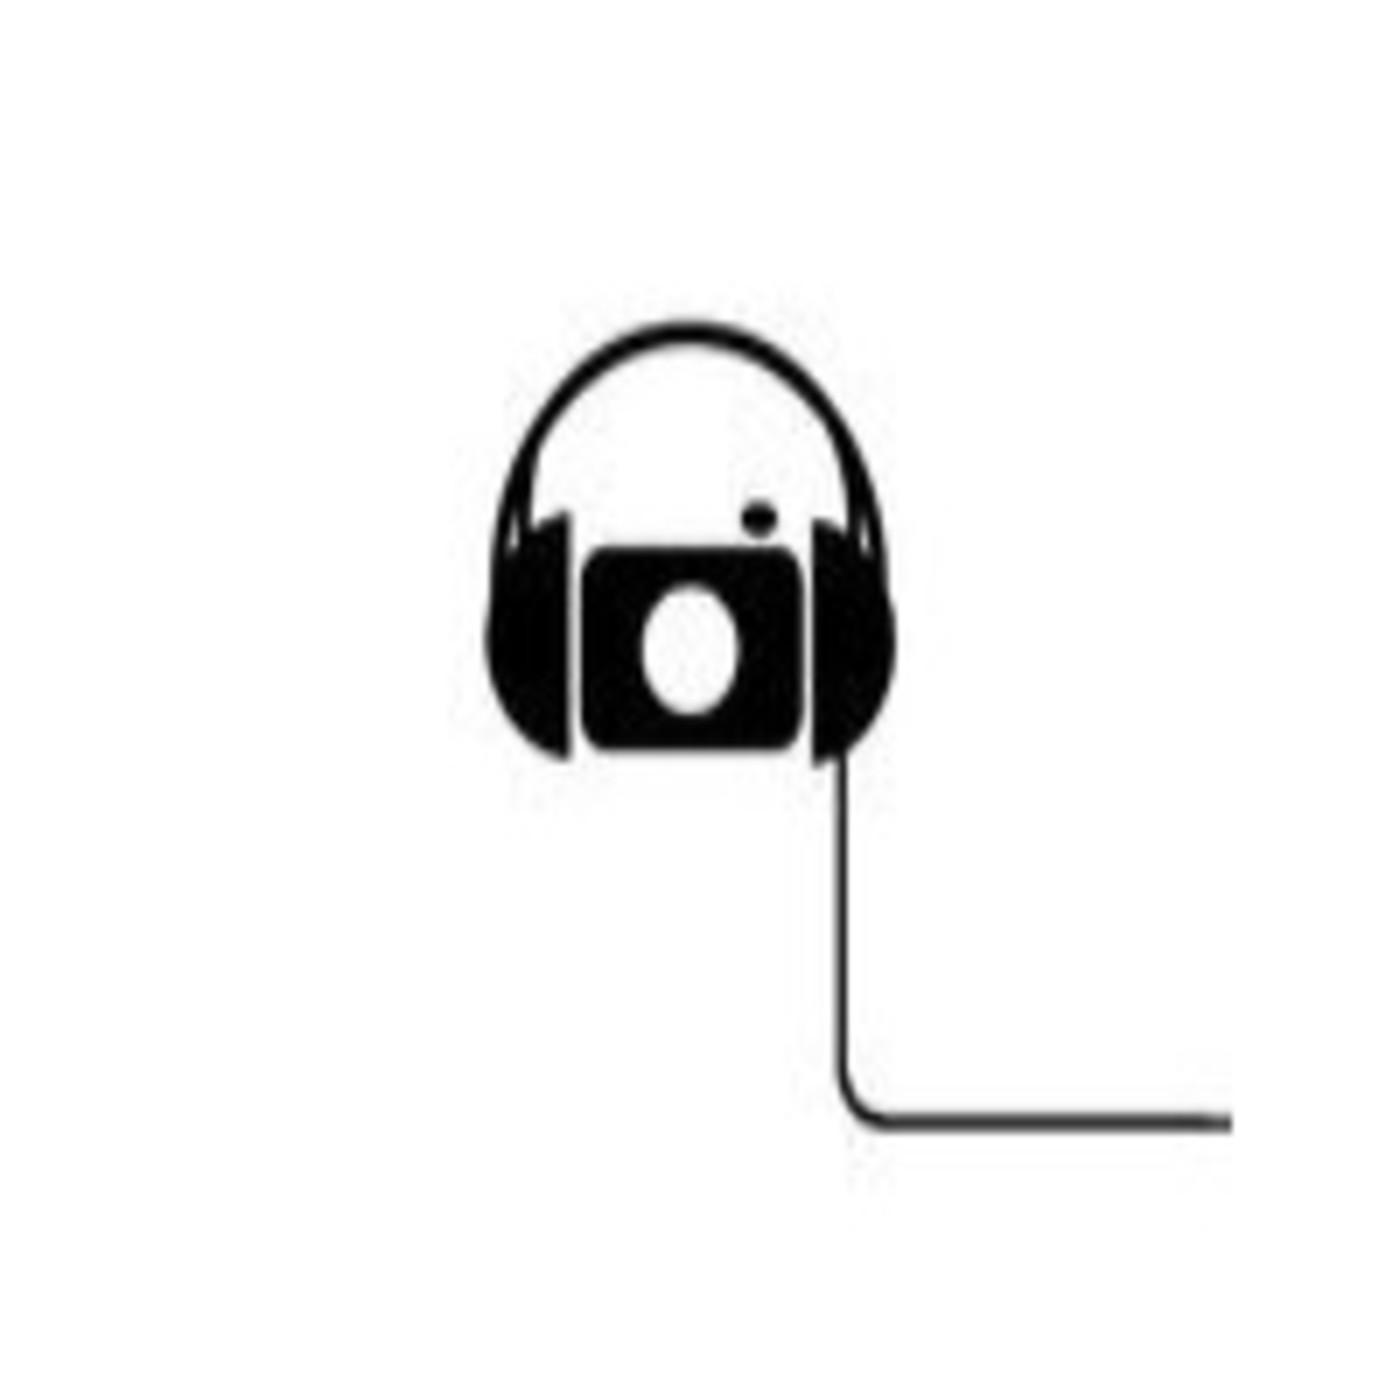 <![CDATA[Podcast djfreeman79]]>